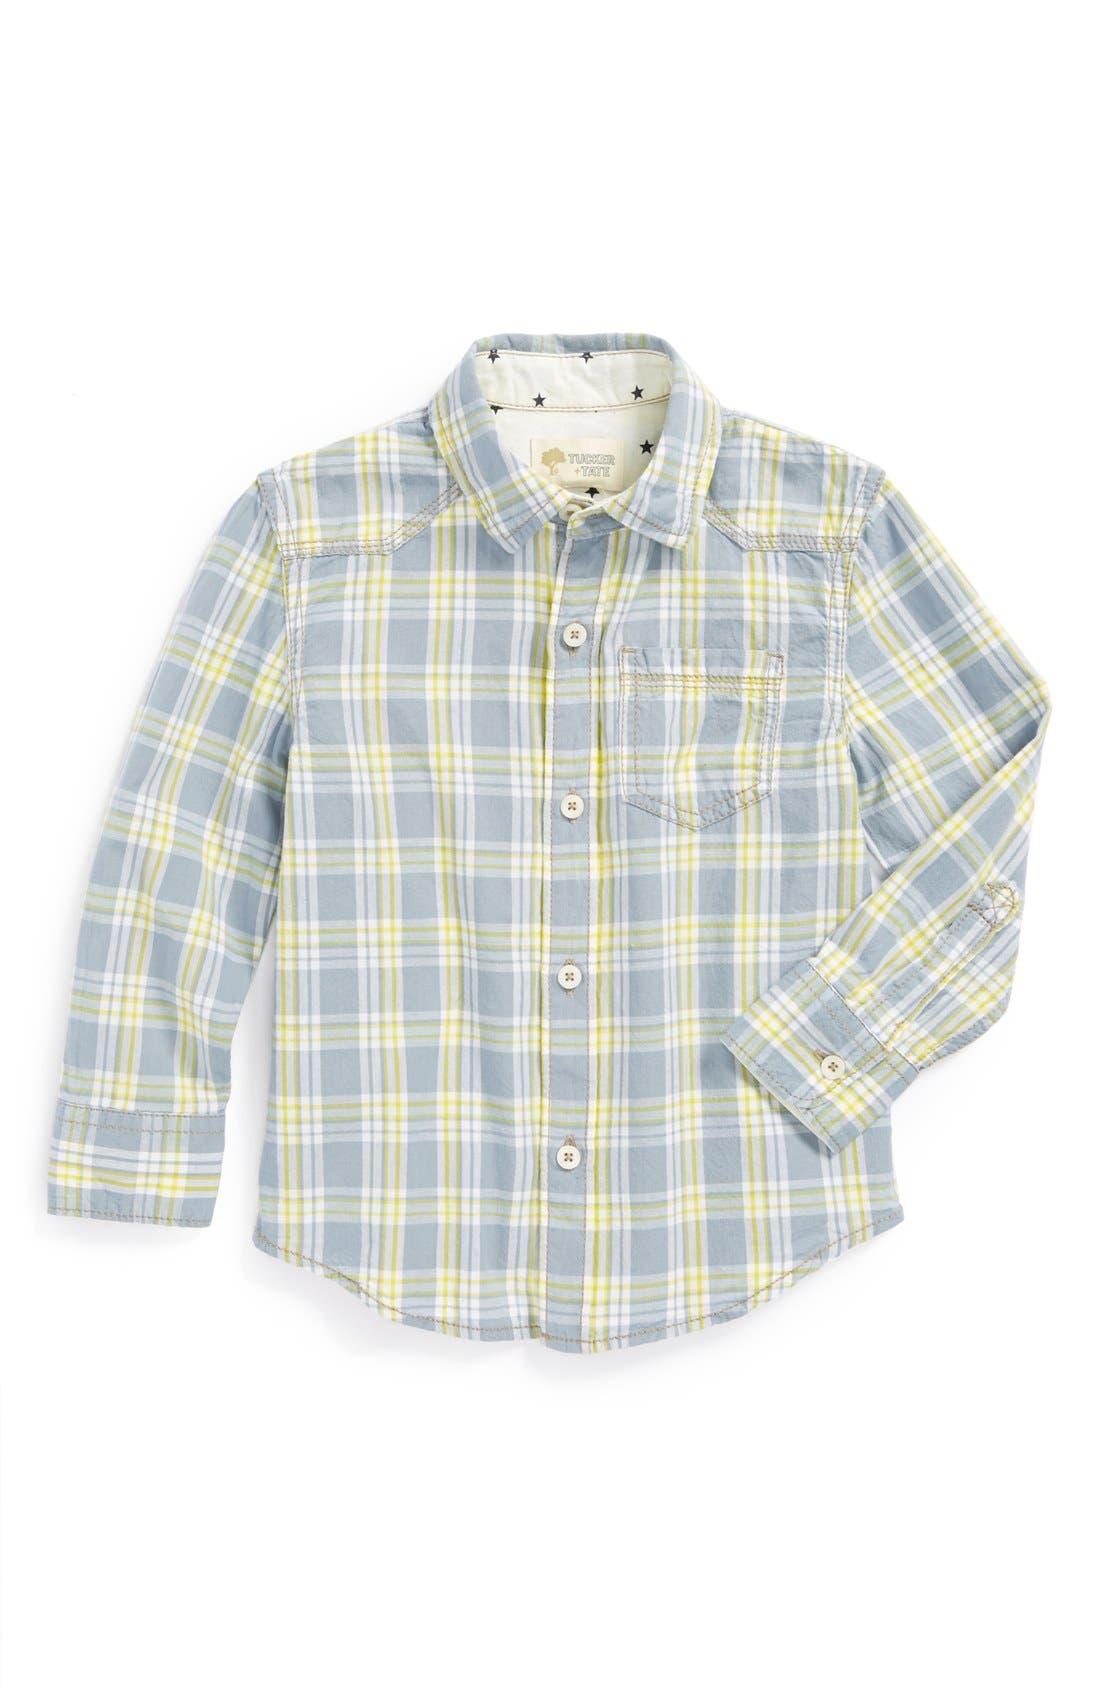 Alternate Image 1 Selected - Tucker + Tate 'Conrad' Plaid Shirt (Toddler Boys & Little Boys)